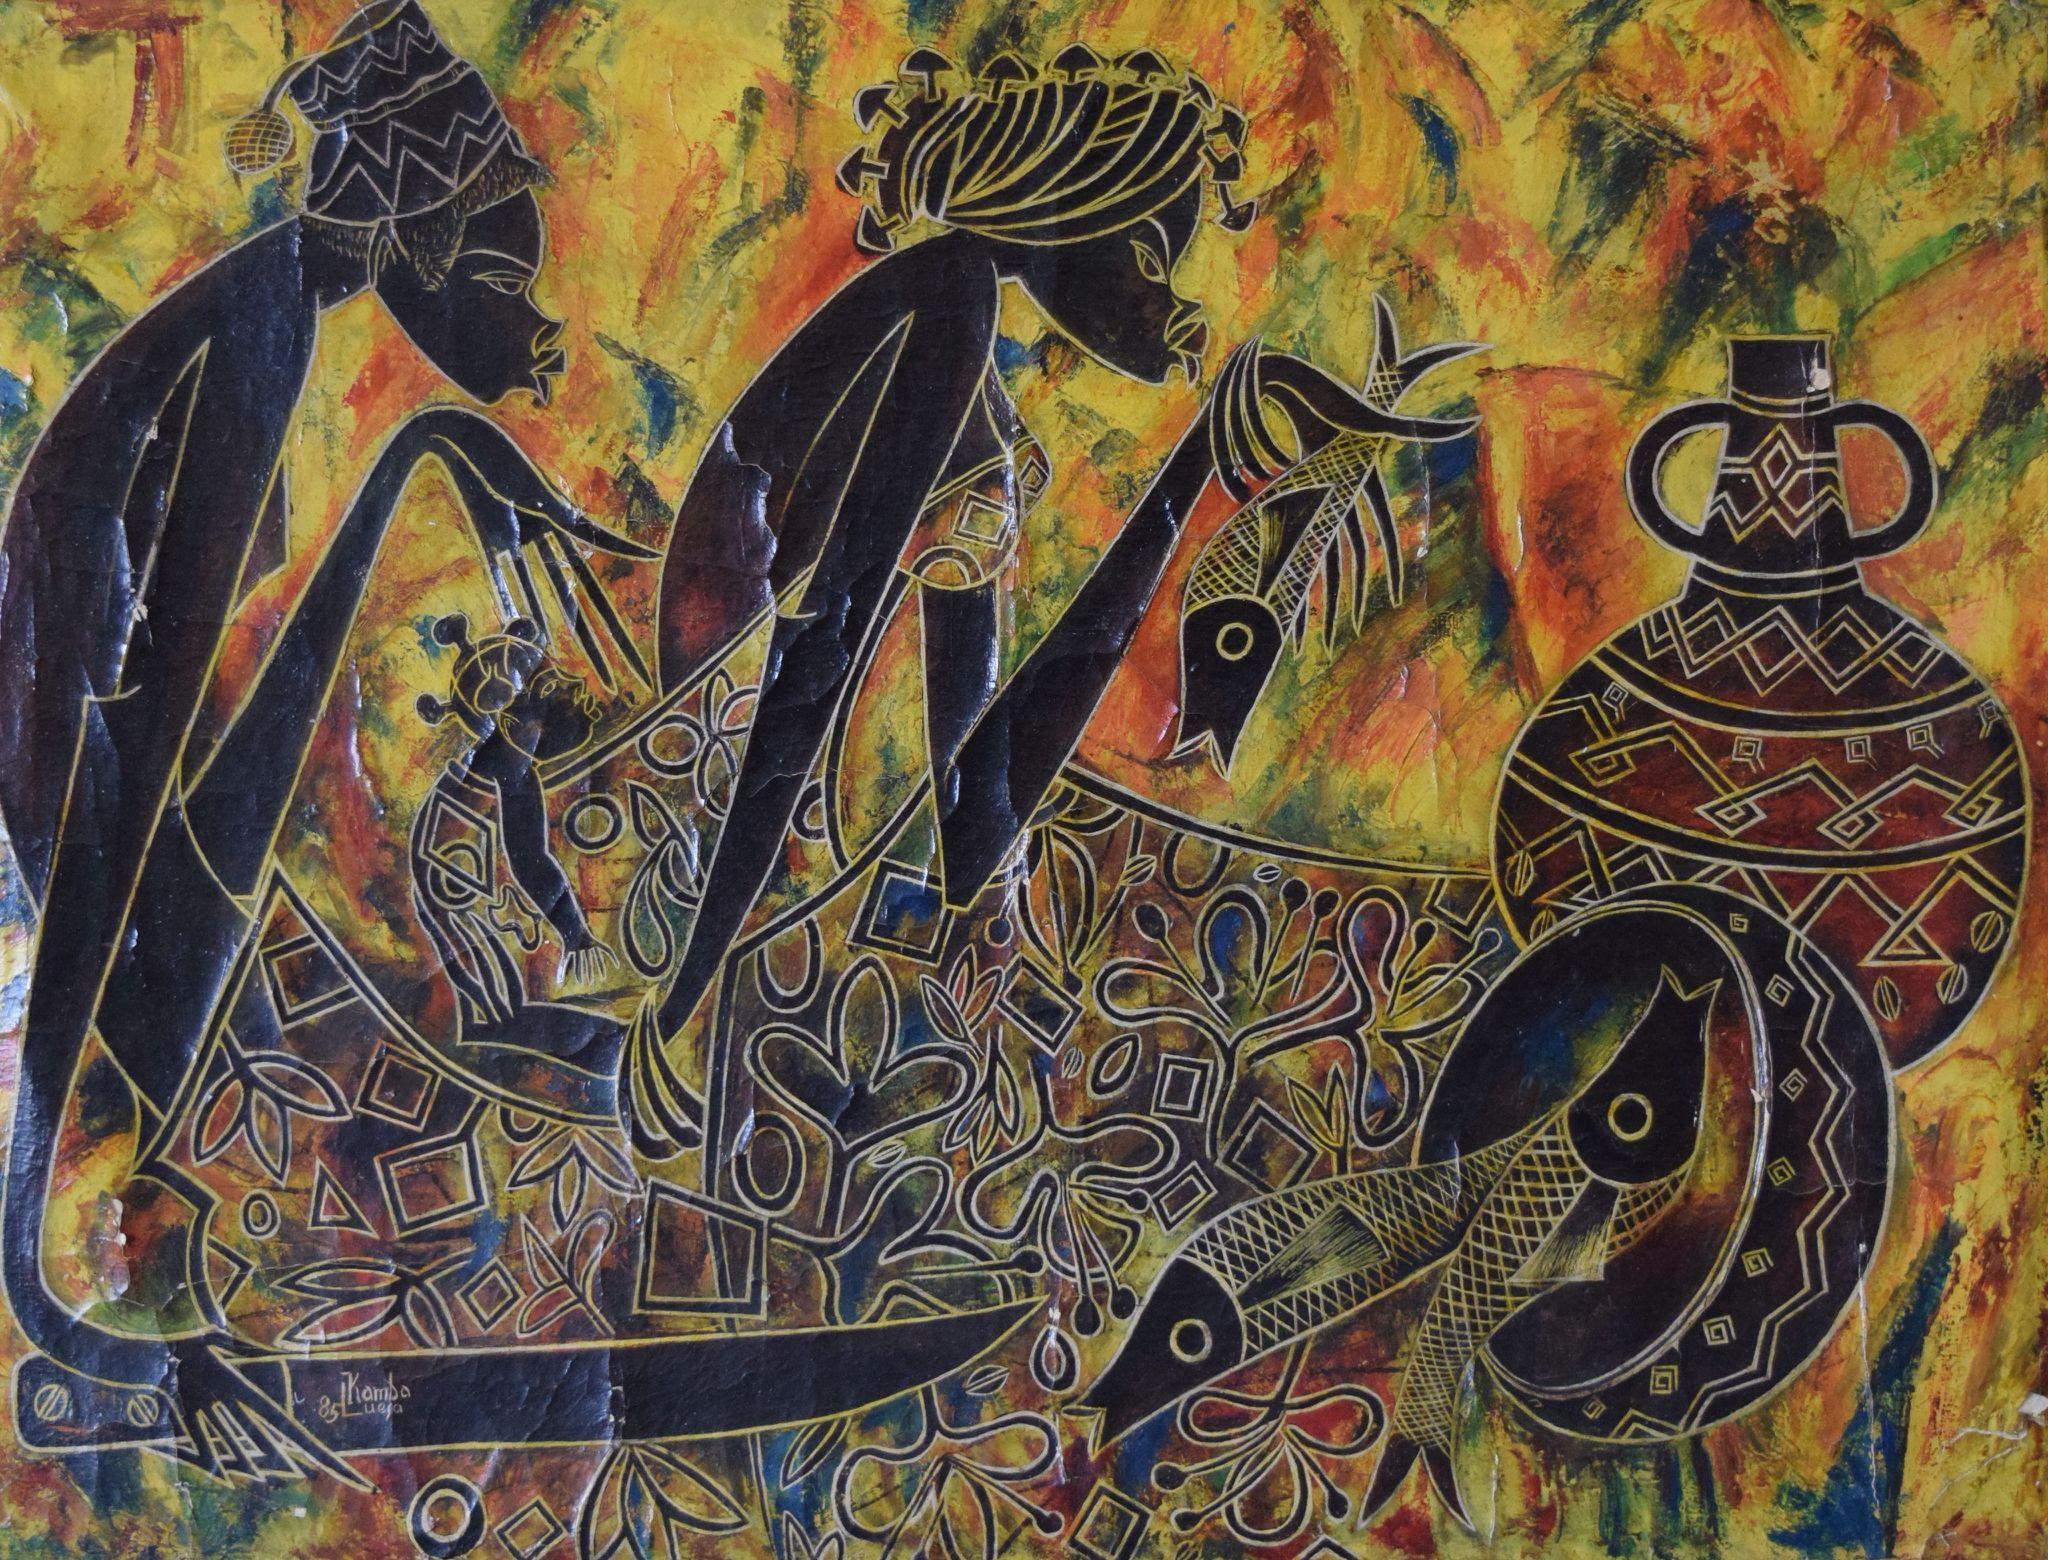 Kamba Luesa 1985. congoart congoartgallery africanart